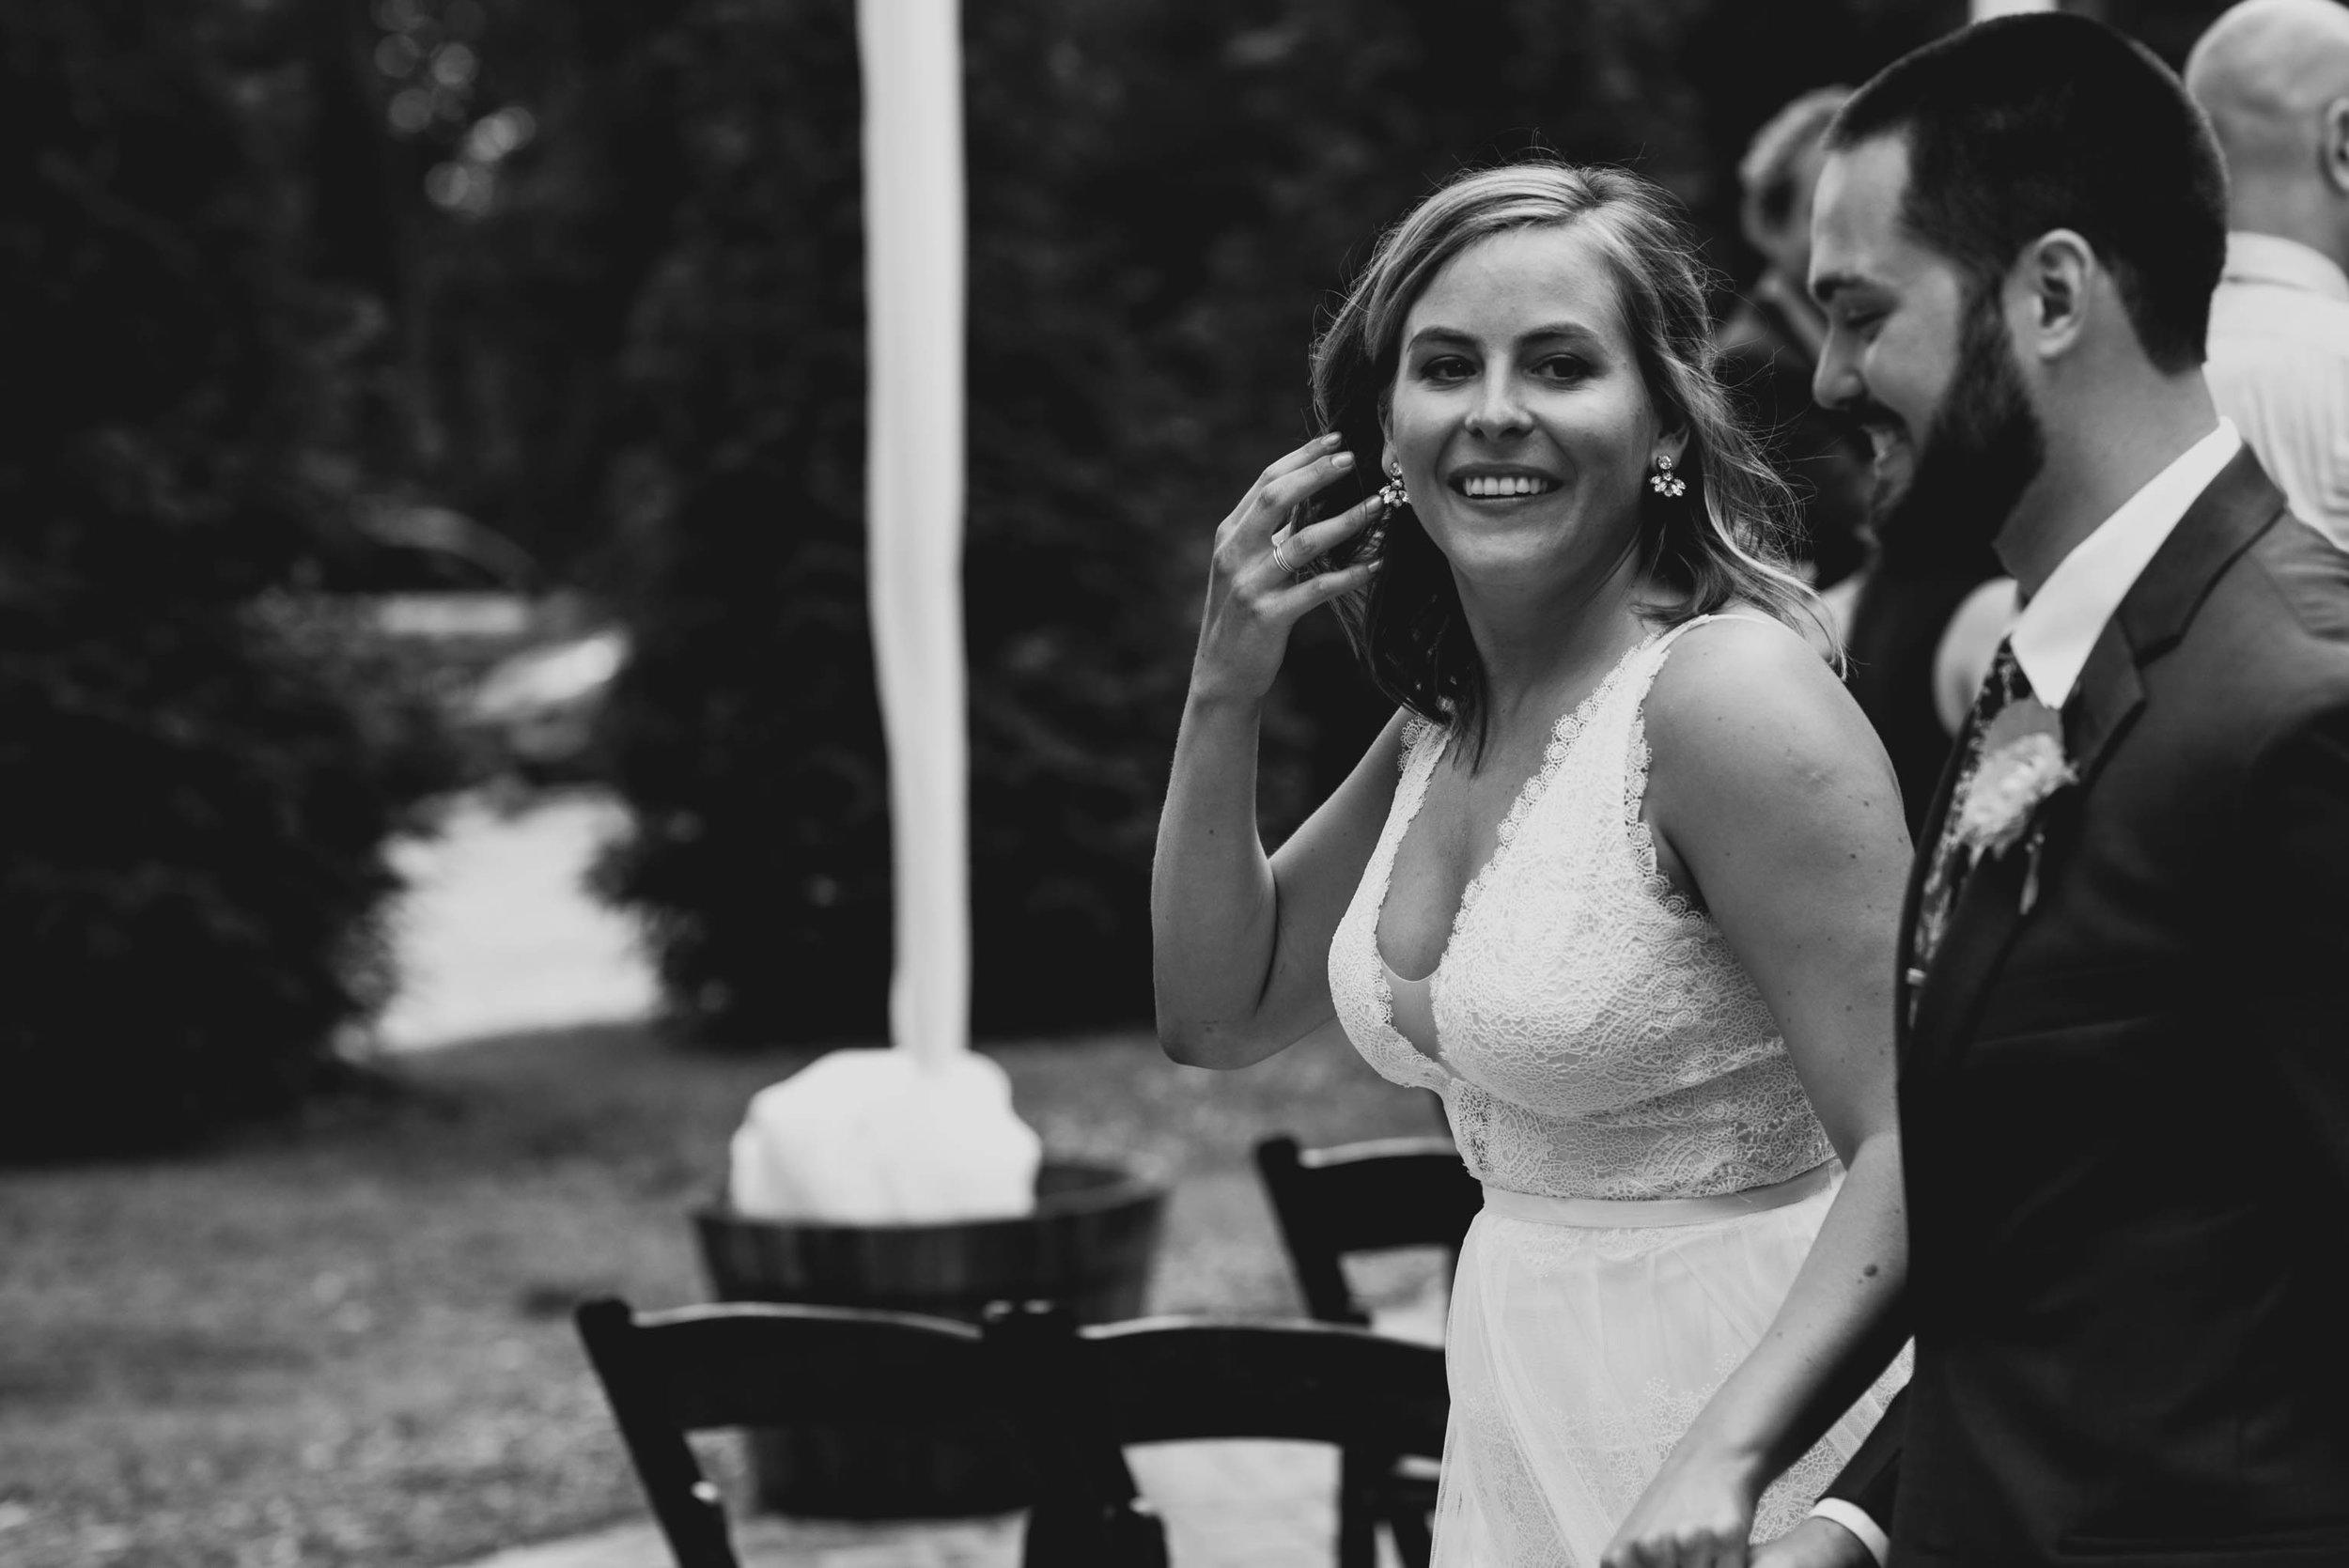 mims-house-wedding-bride-and-groom-photos.jpg